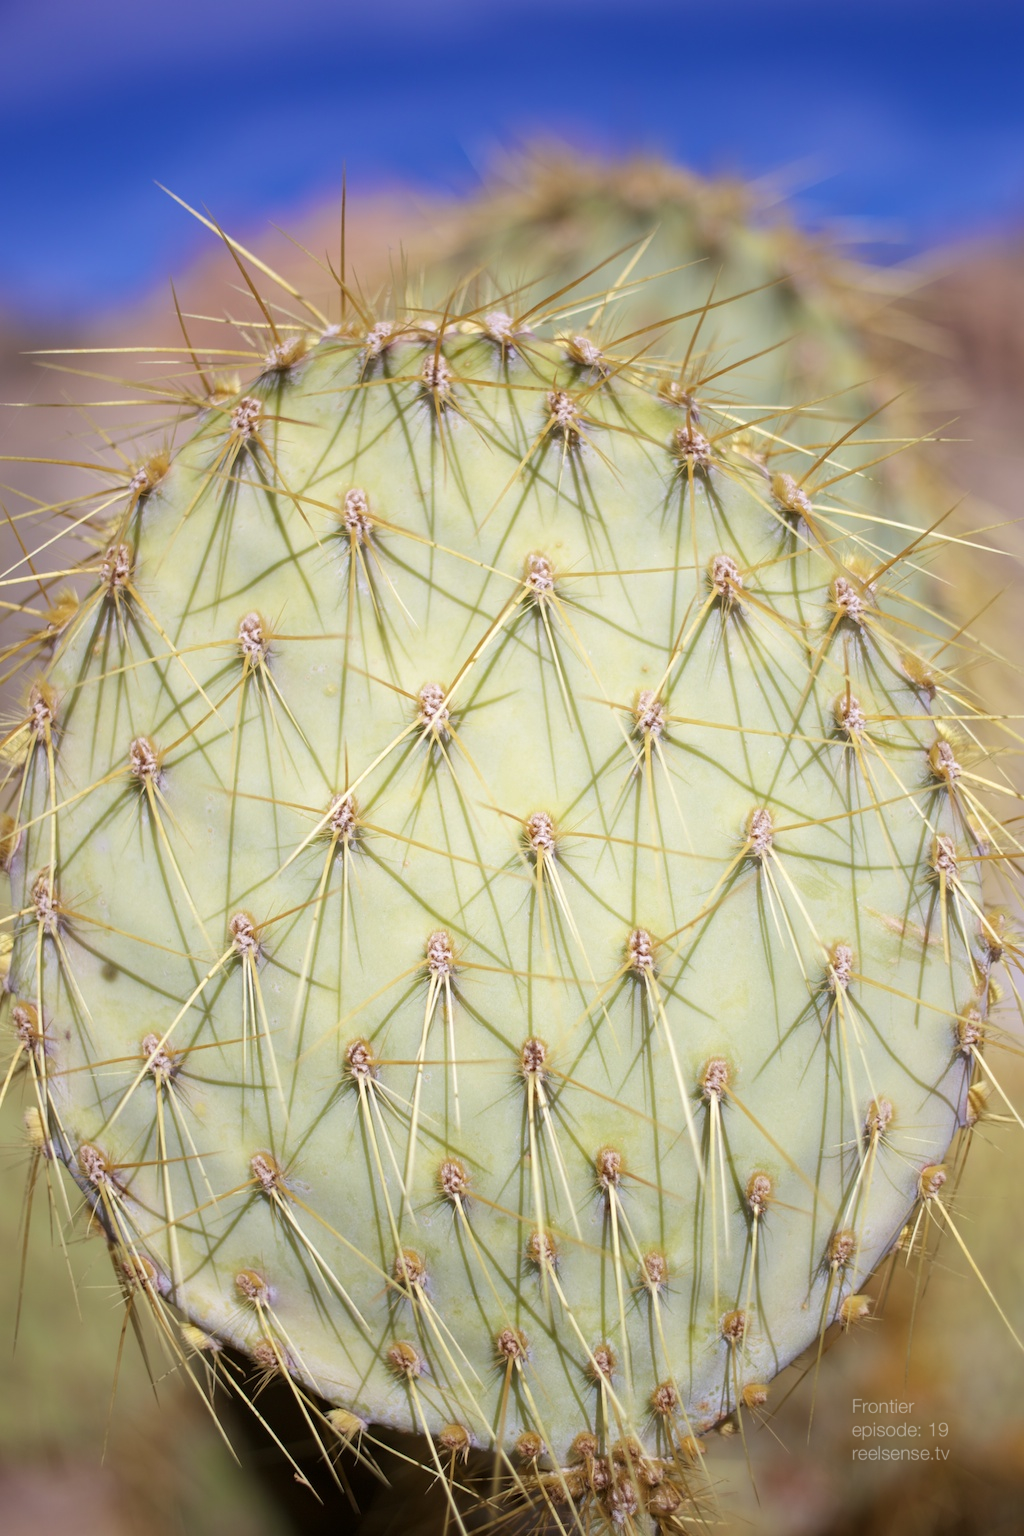 Joshua Tree - Local cactus